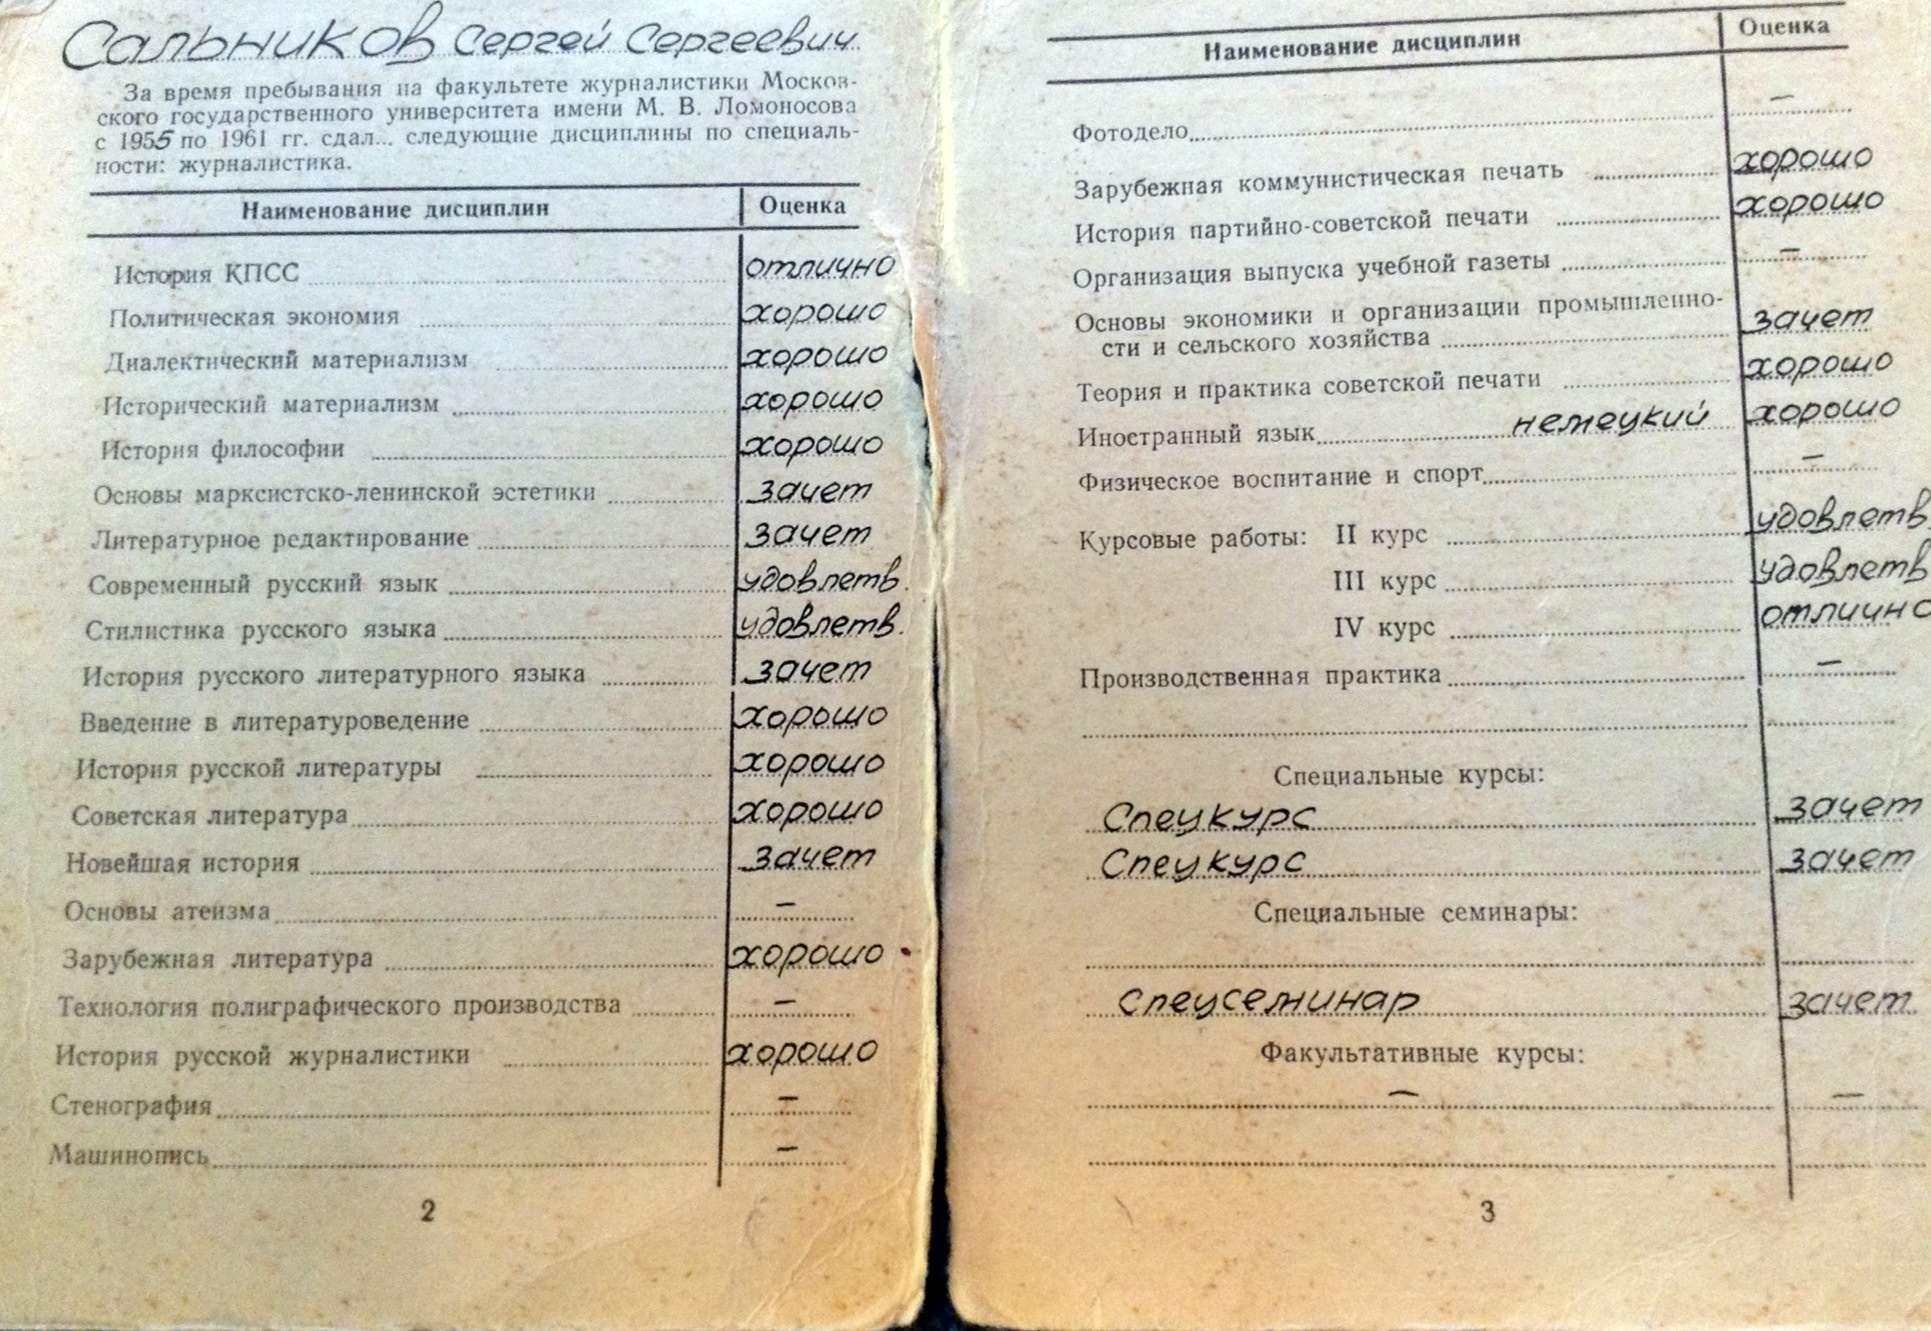 Диплом Сергея Сальникова об окончании журфака МГУ